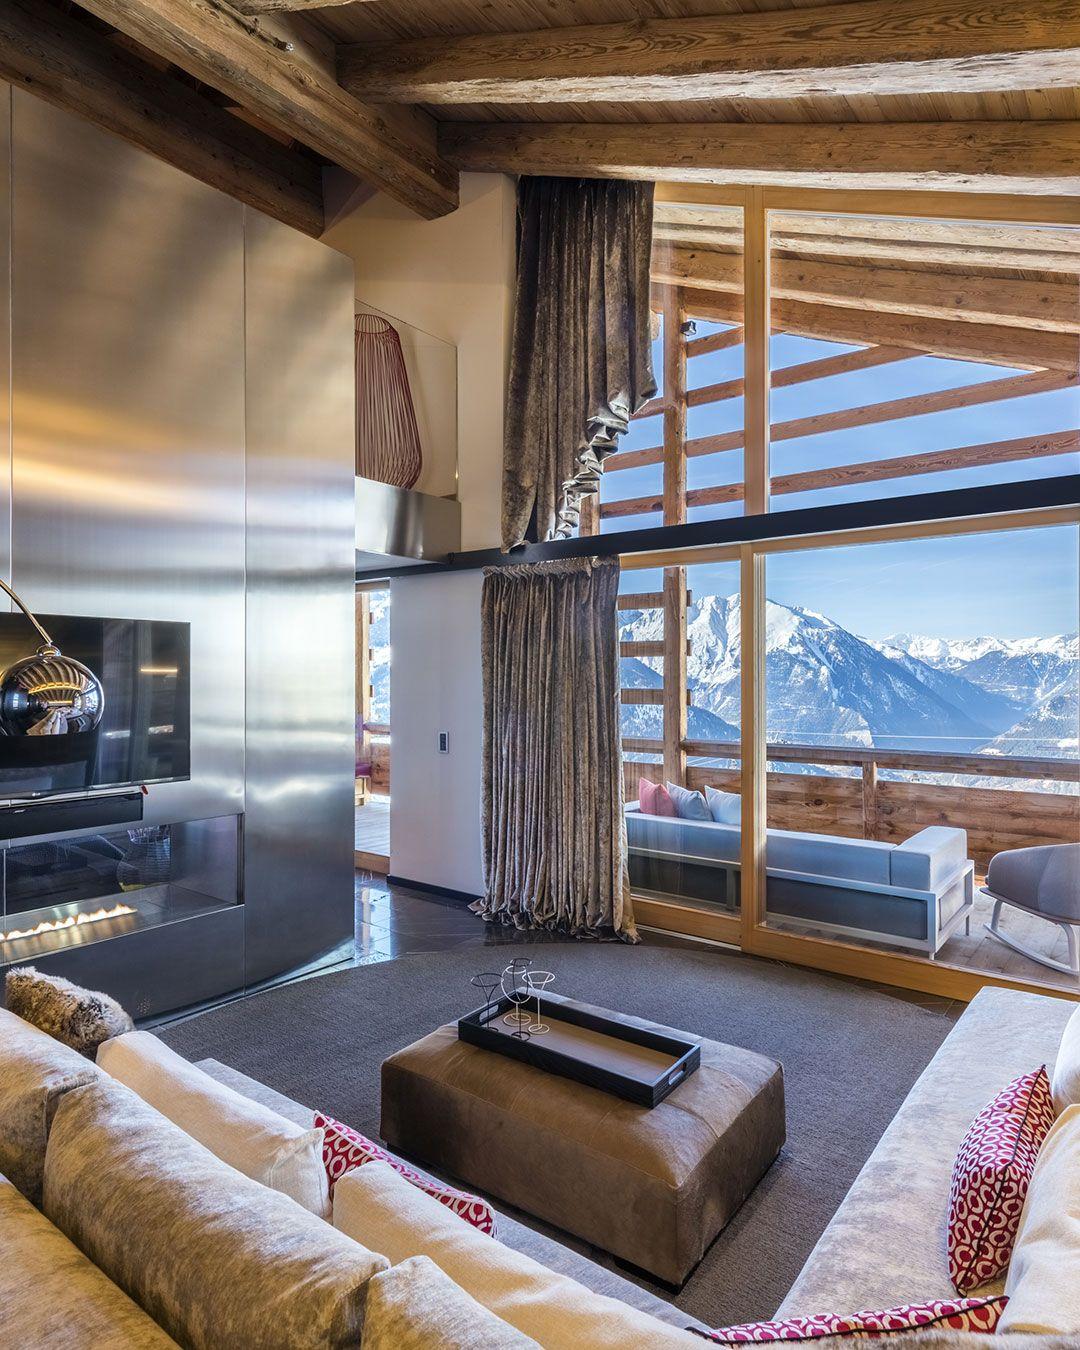 W Verbier Hotels In Heaven Switzerland Hotels Hotel Chalet Interior W living room verbier